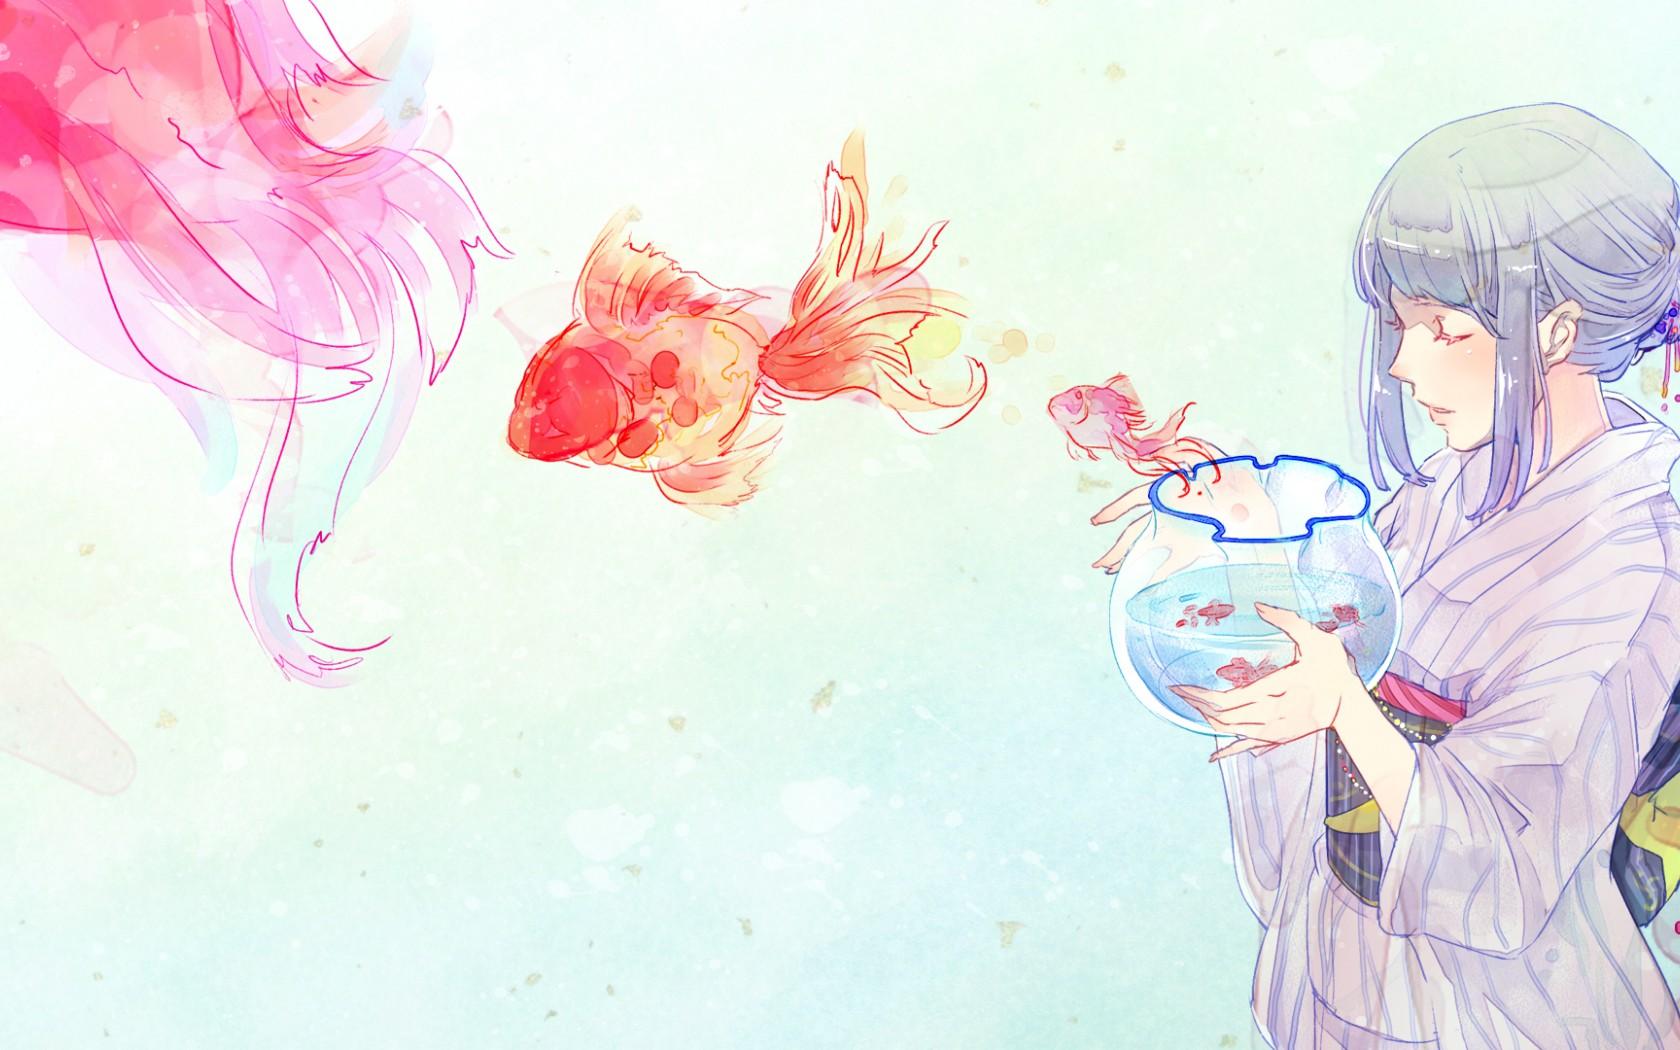 Обои аниме на рабочий стол аквариум